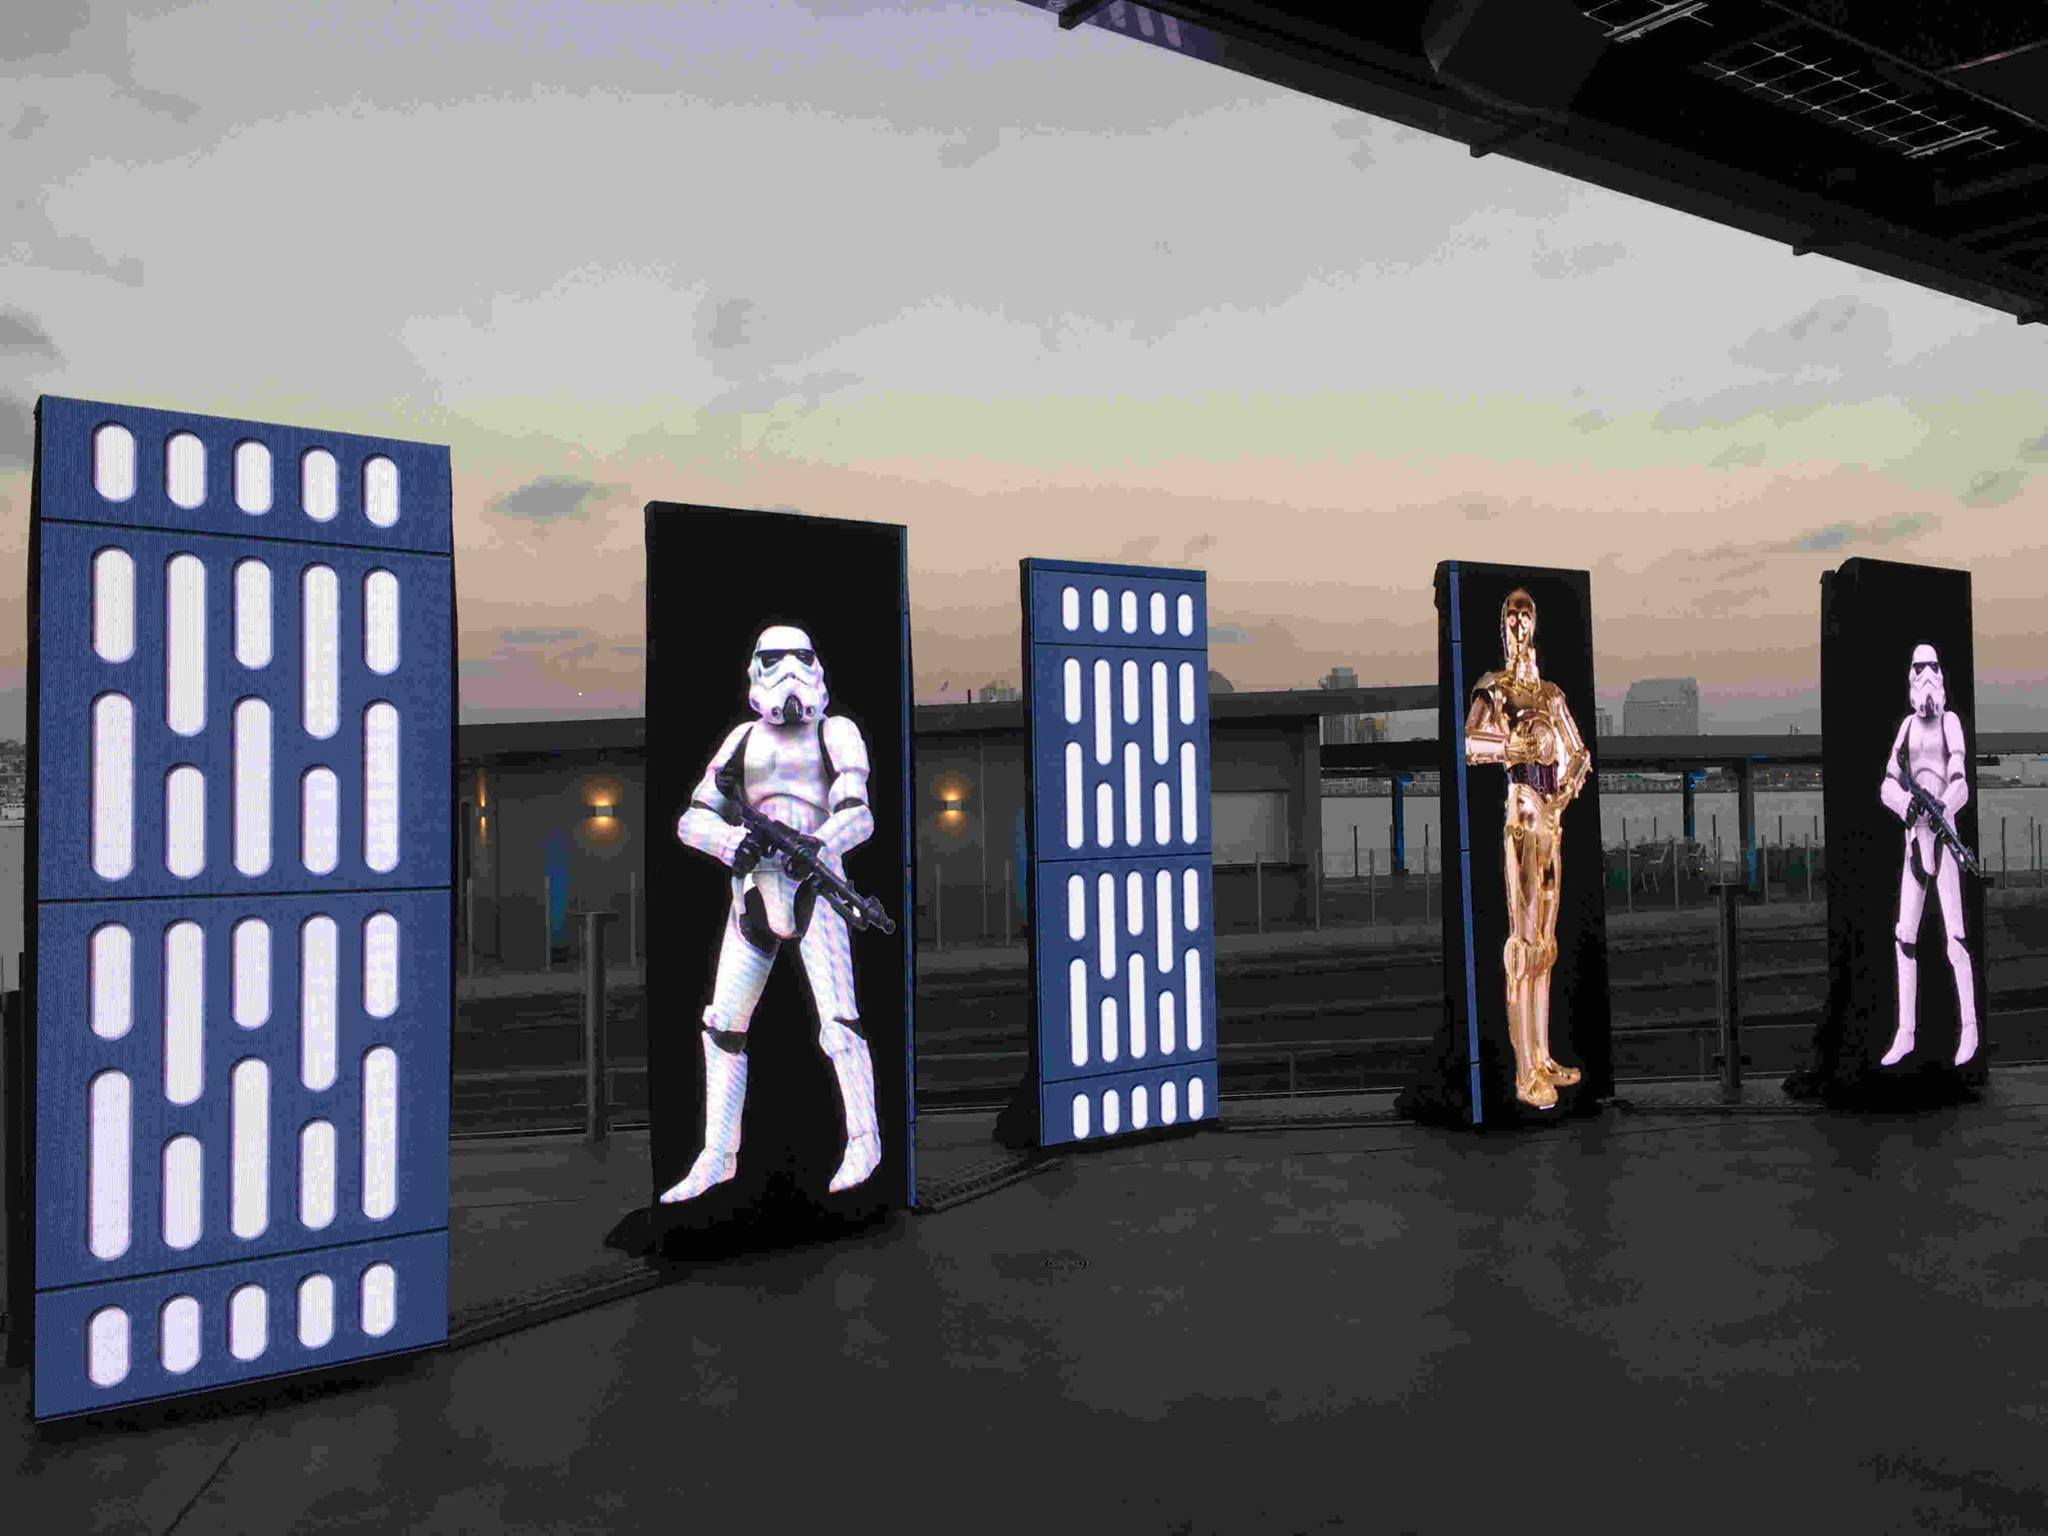 eventavision storm troopers.jpg